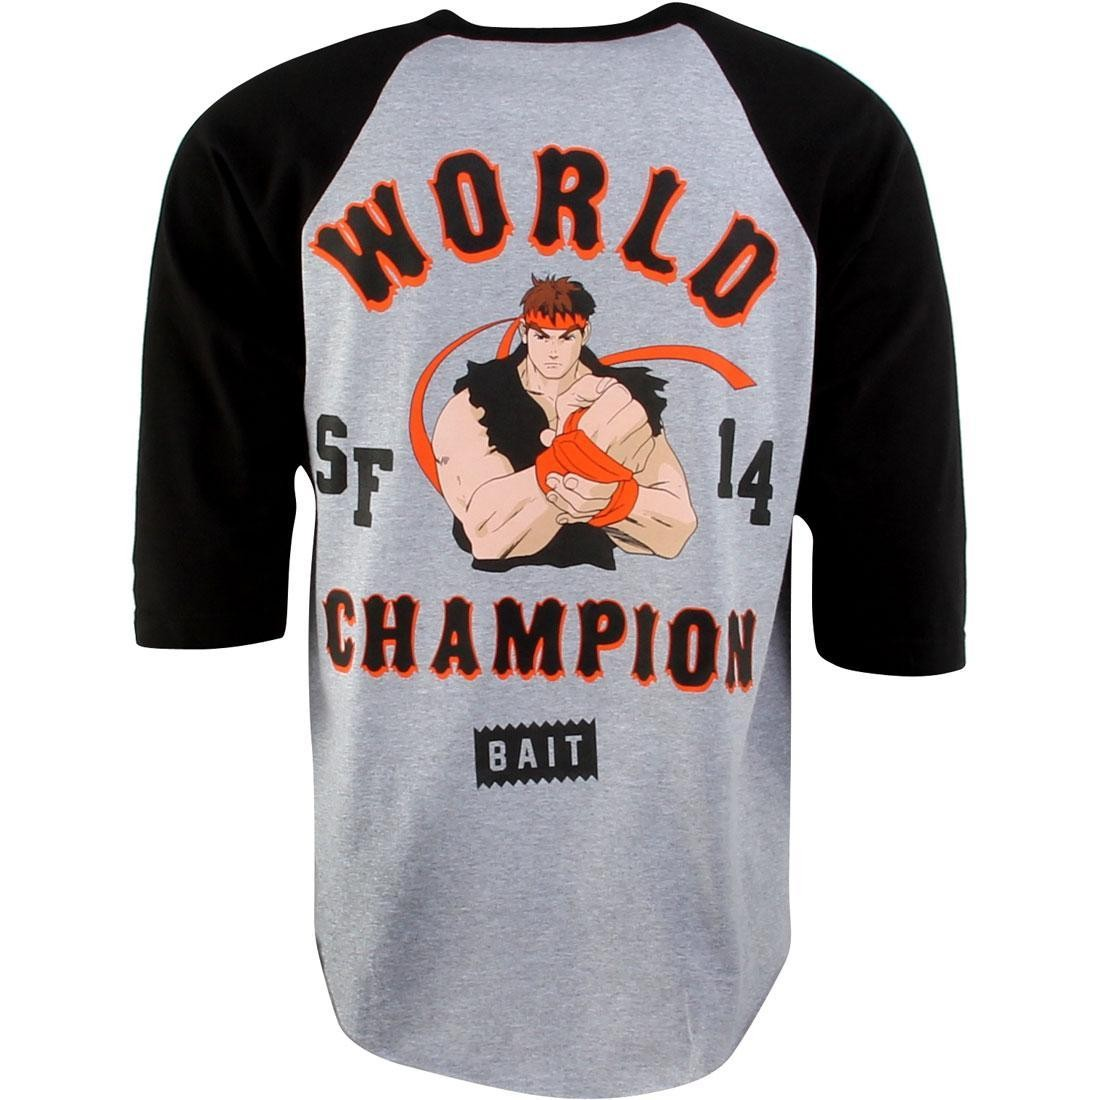 BAIT x Street Fighter Ryu Championship 2014 Raglan Tee (gray / athletic heather / black)